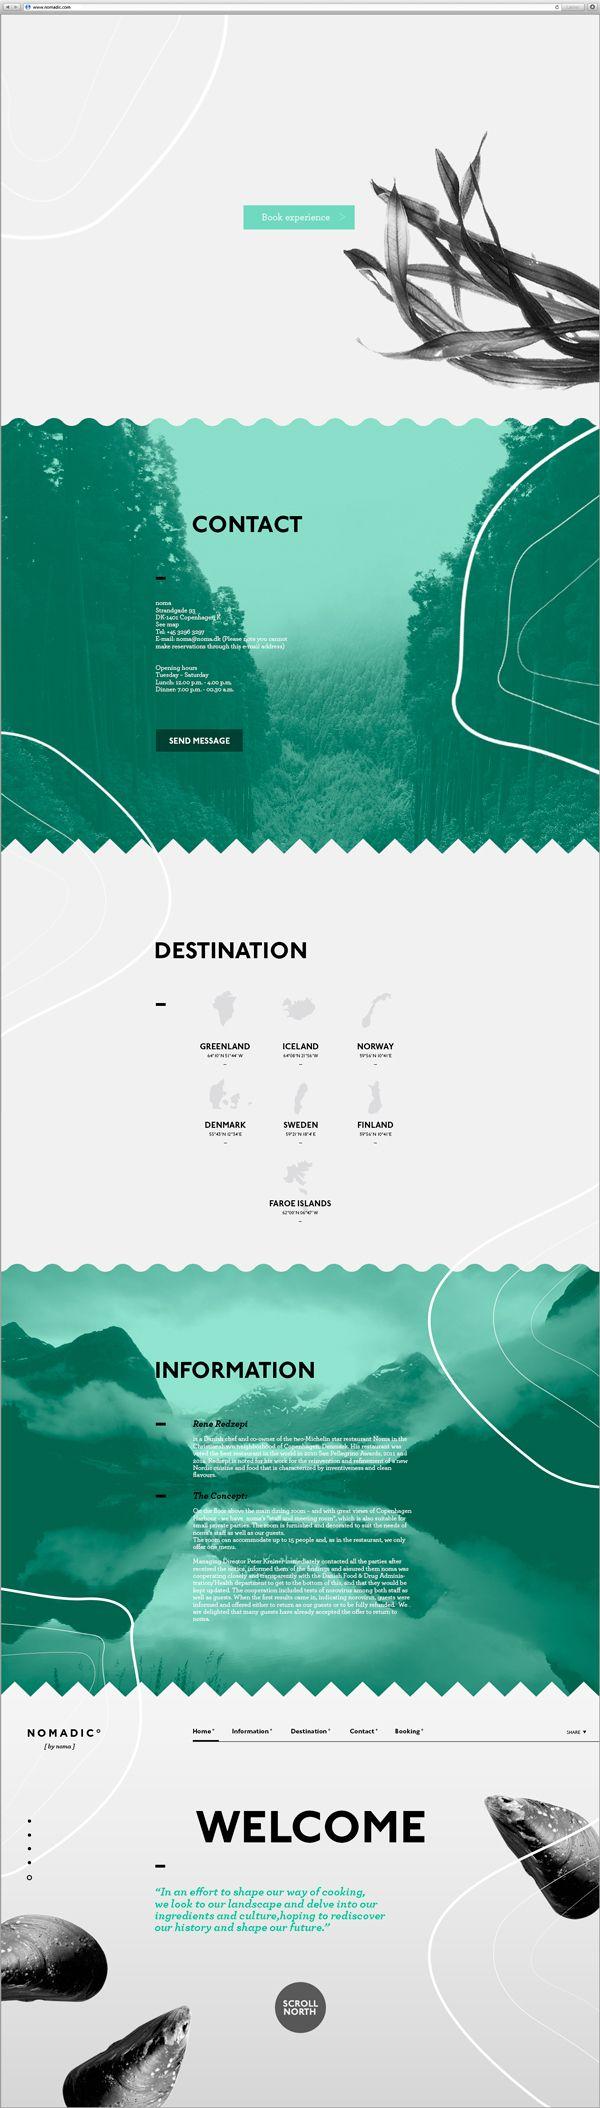 Nomadic [by noma] by Louise Lahn, via Behance